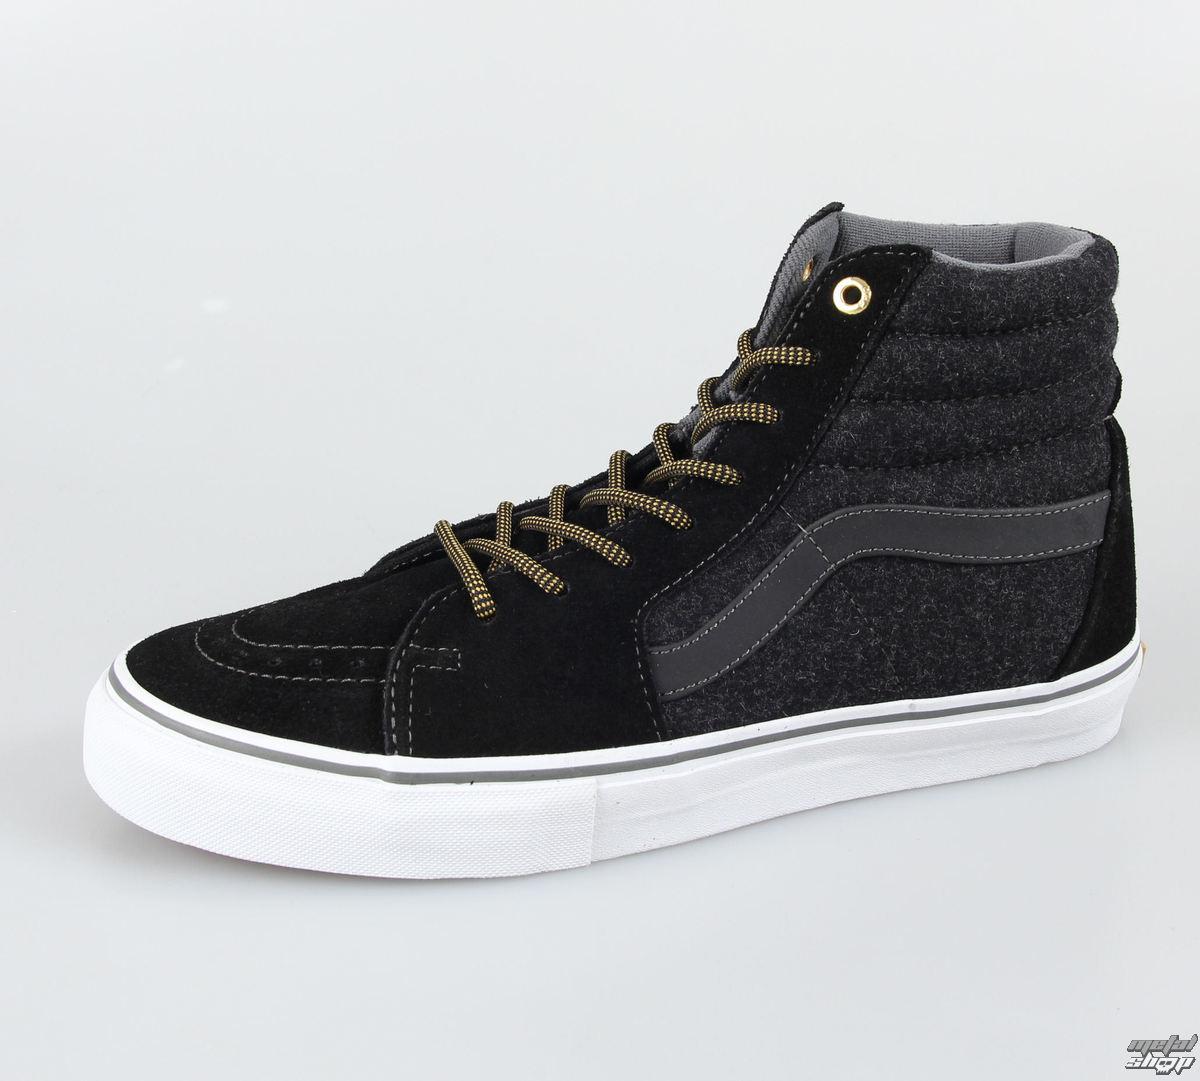 boty pánské VANS - SK8 HI PRO (Wool) - Black/Go - V99N775